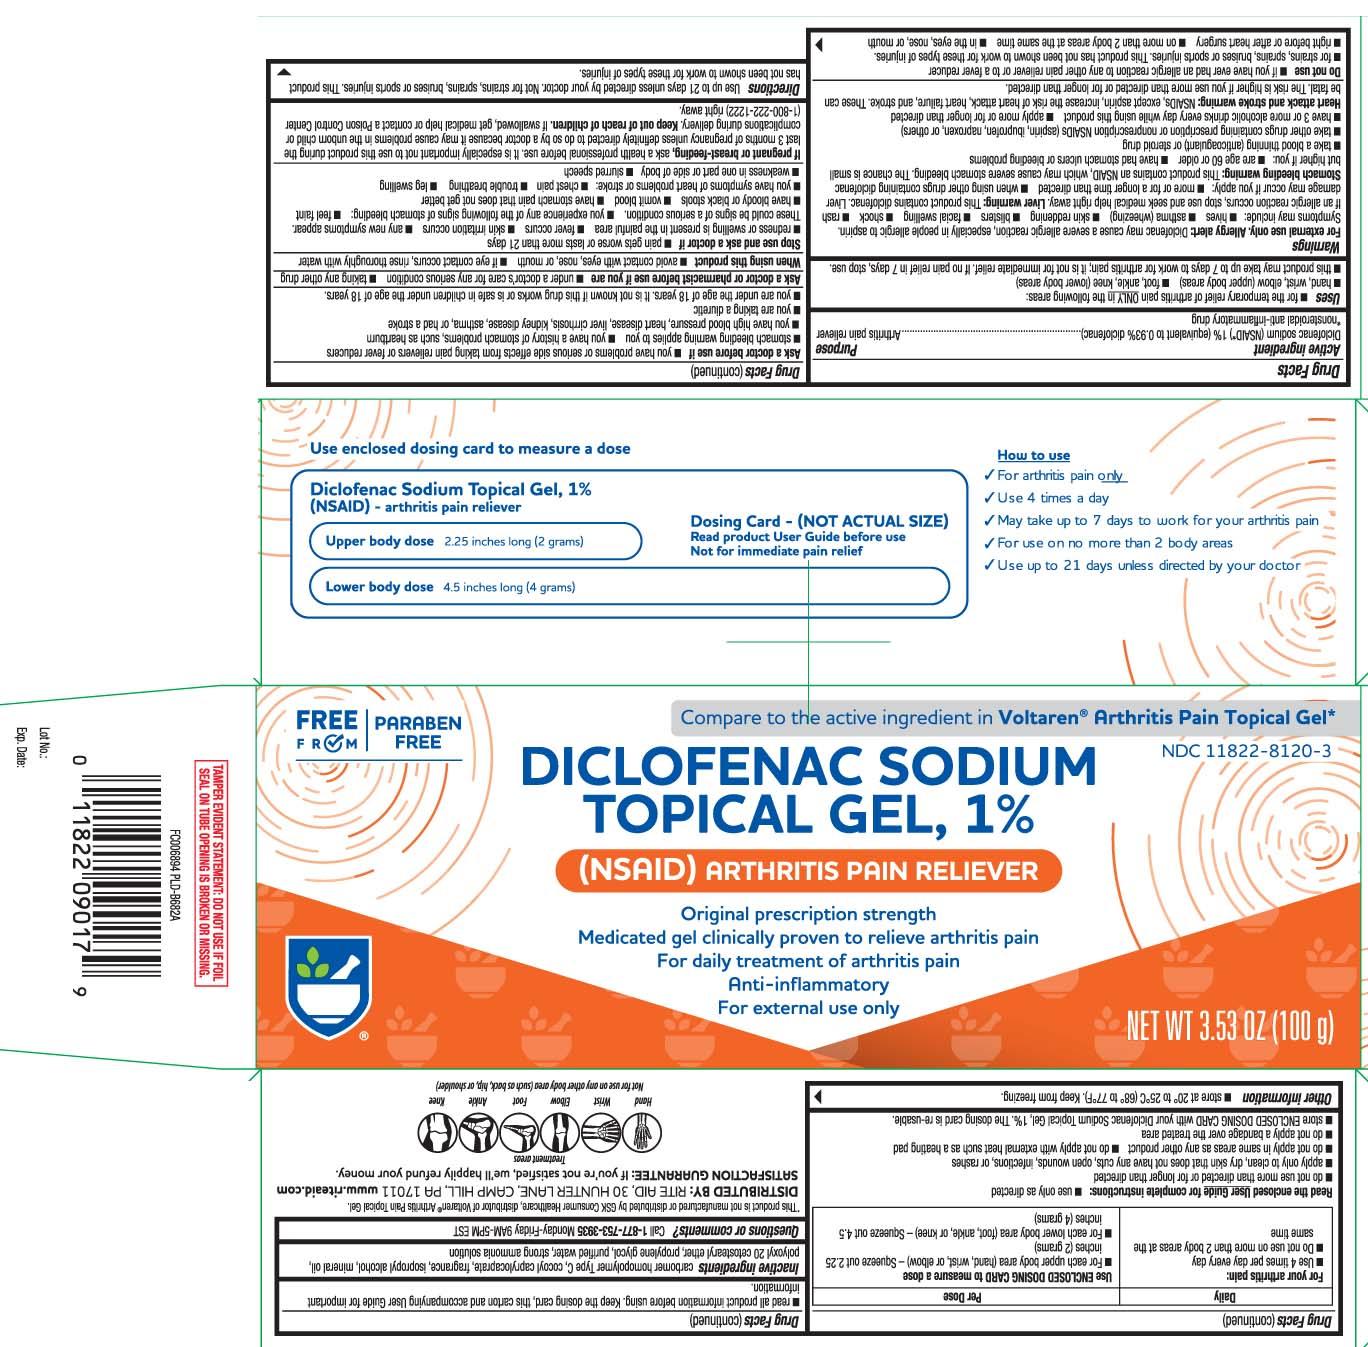 Diclofenac sodium (NSAID*) 1% (equivalent to 0.93% diclofenac) *nonsteroidal anti-inflammatory drug